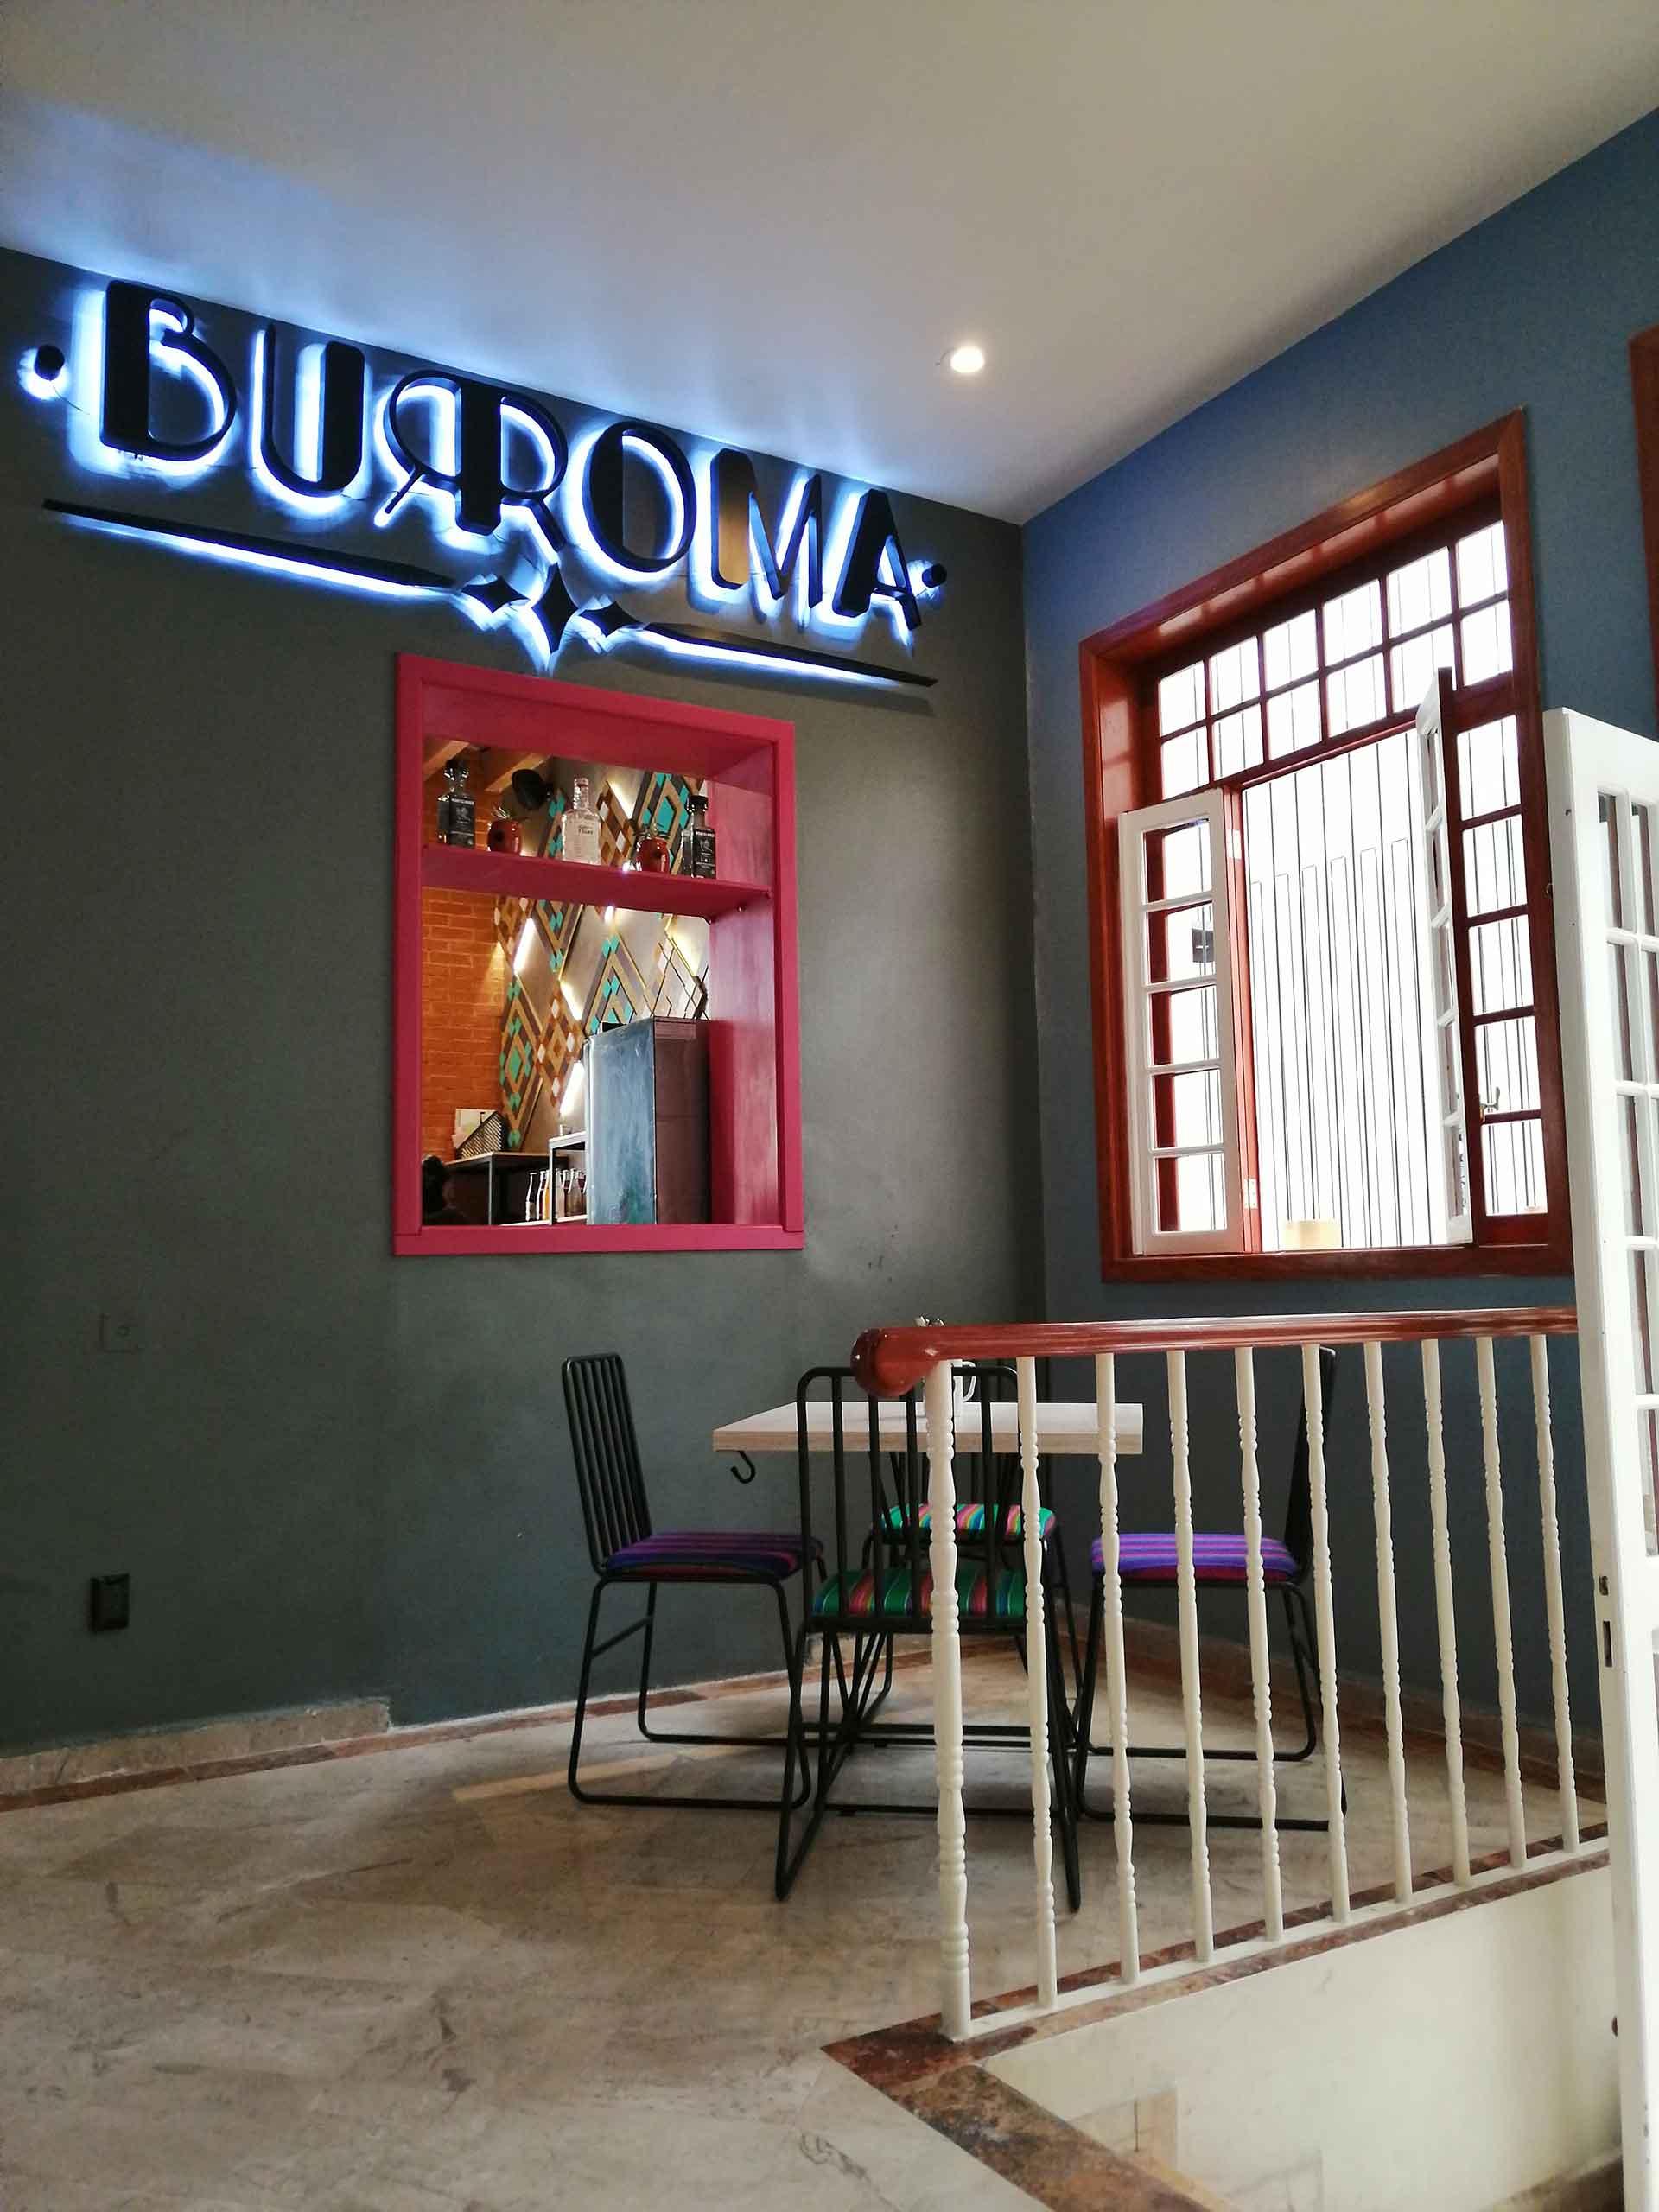 Burroma